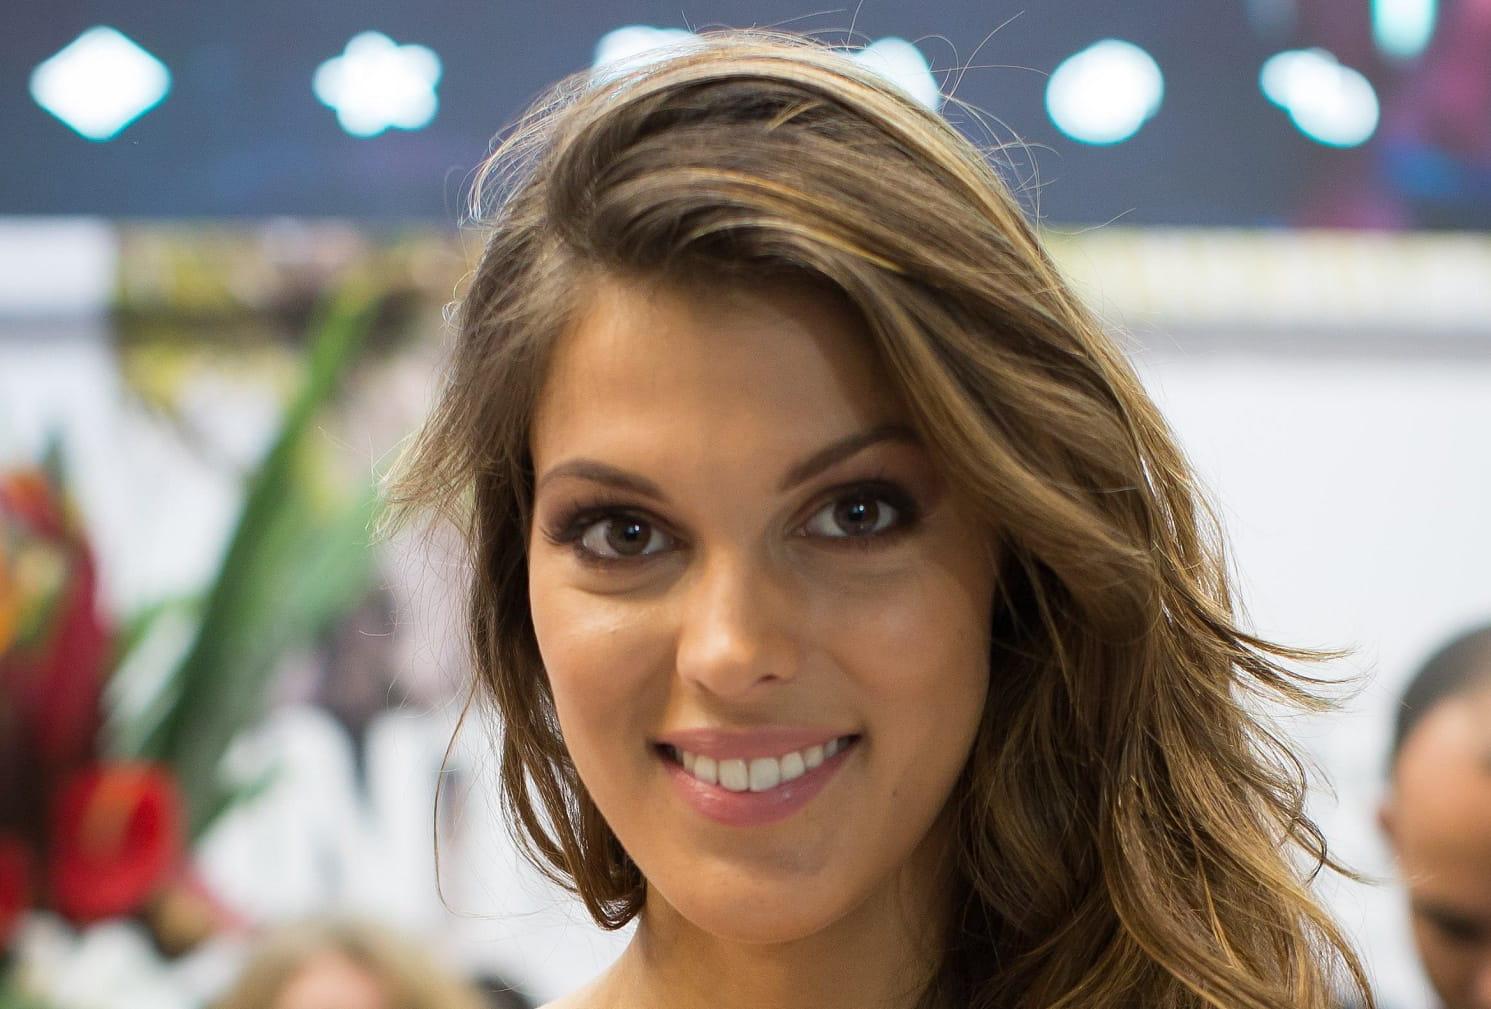 Miss france 2017 date candidates favorites places gagnante montpellier tout savoir - Miss france 2017 interview ...